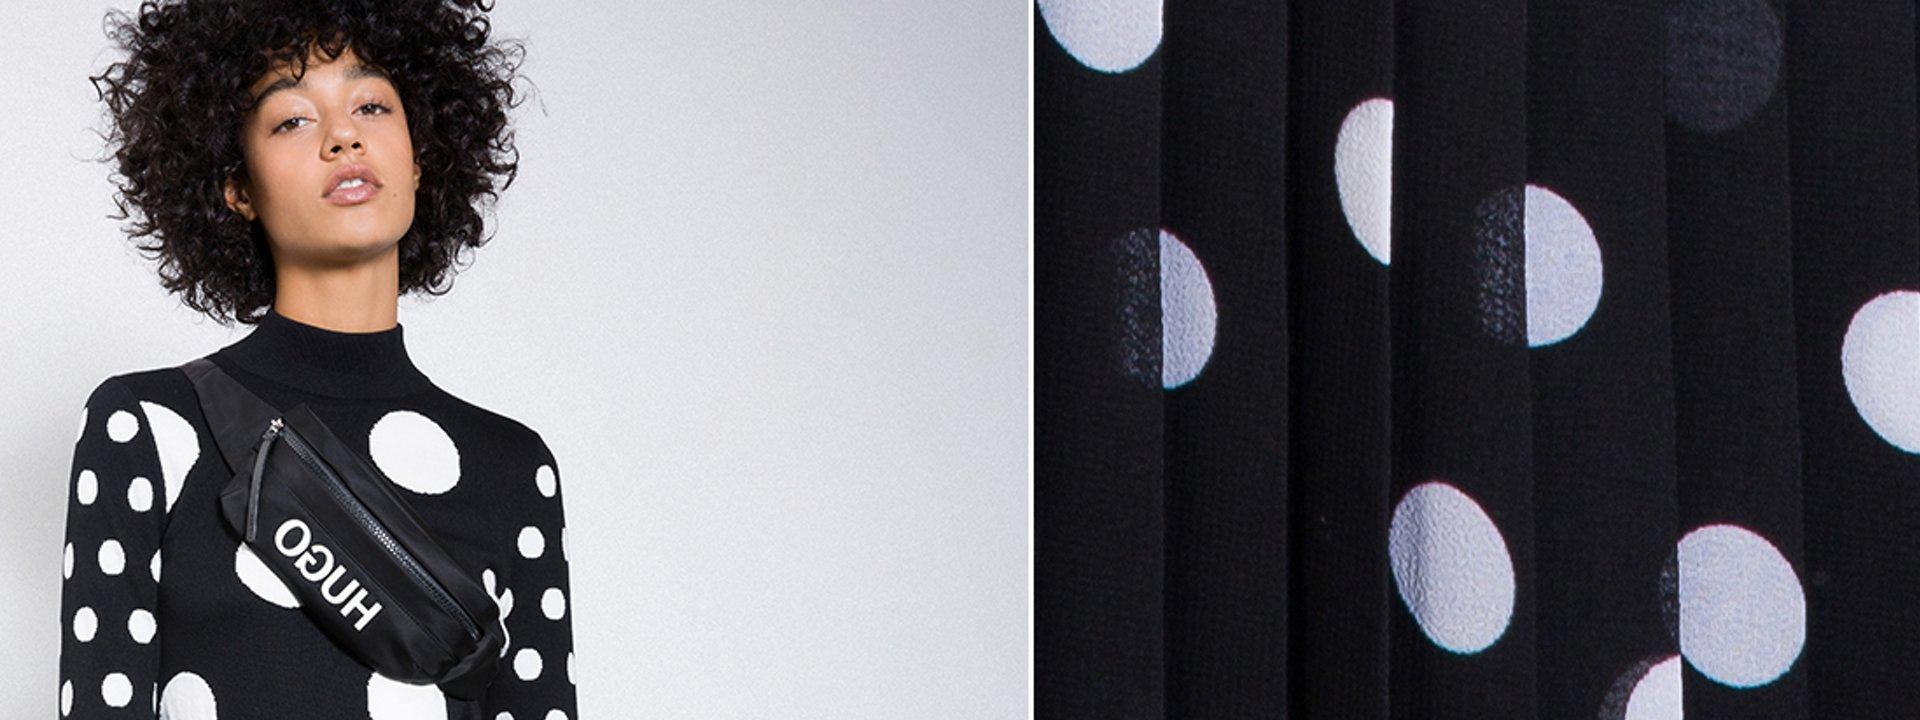 c3e5ec8a15fa Female model wearing a black shirt with dots and a black skirt with dots by  HUGO ...